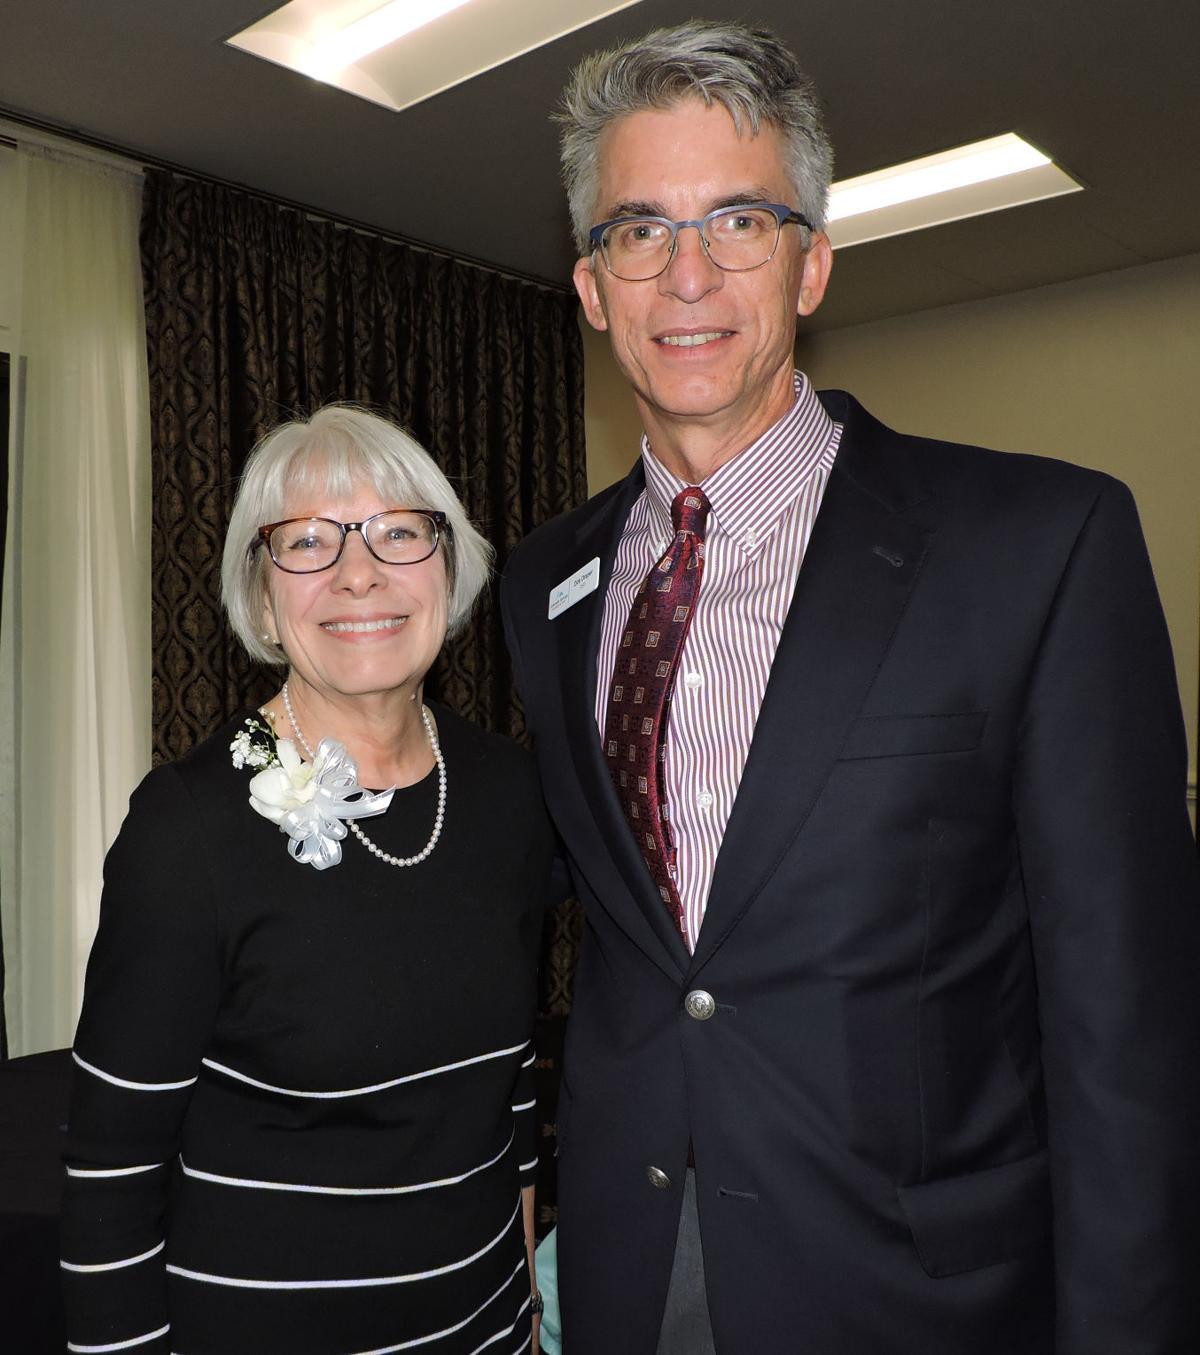 Colorado Springs Chamber and EDC CEO Dirk Draper with 2018 Athena Award recipient Jan Weiland. 040518 Photo by Linda Navarro